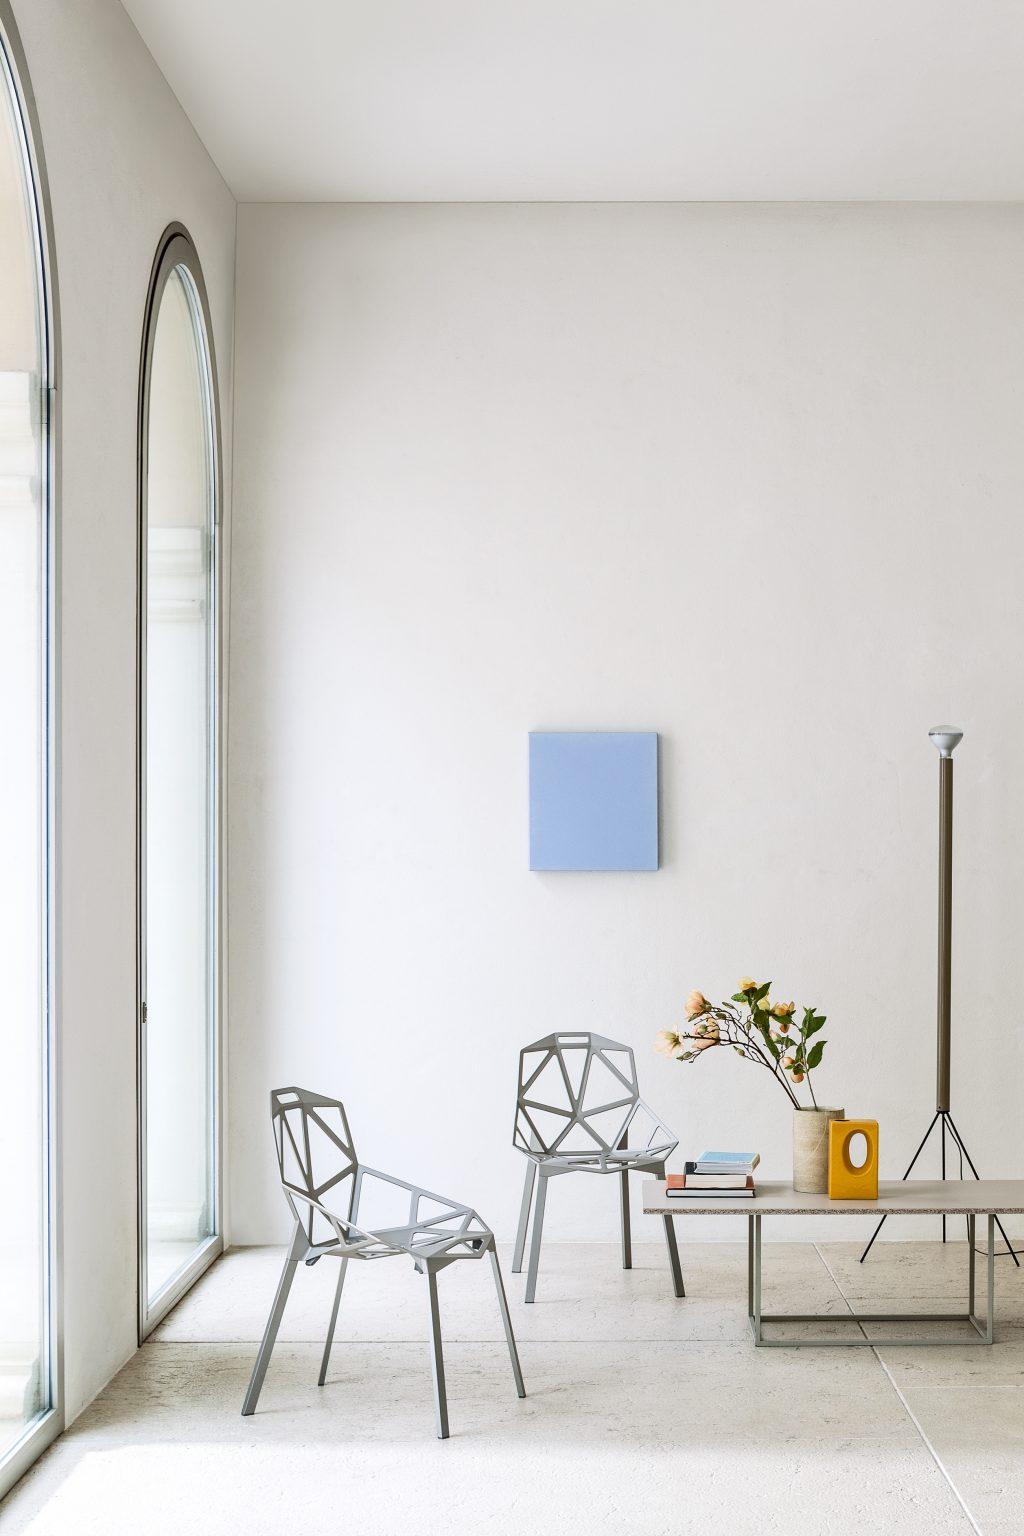 Biennale Interieur - Belgium's leading design and interior event - Magis_chair_one_ambient_mono_sd5460_grey_01_hr.jpg